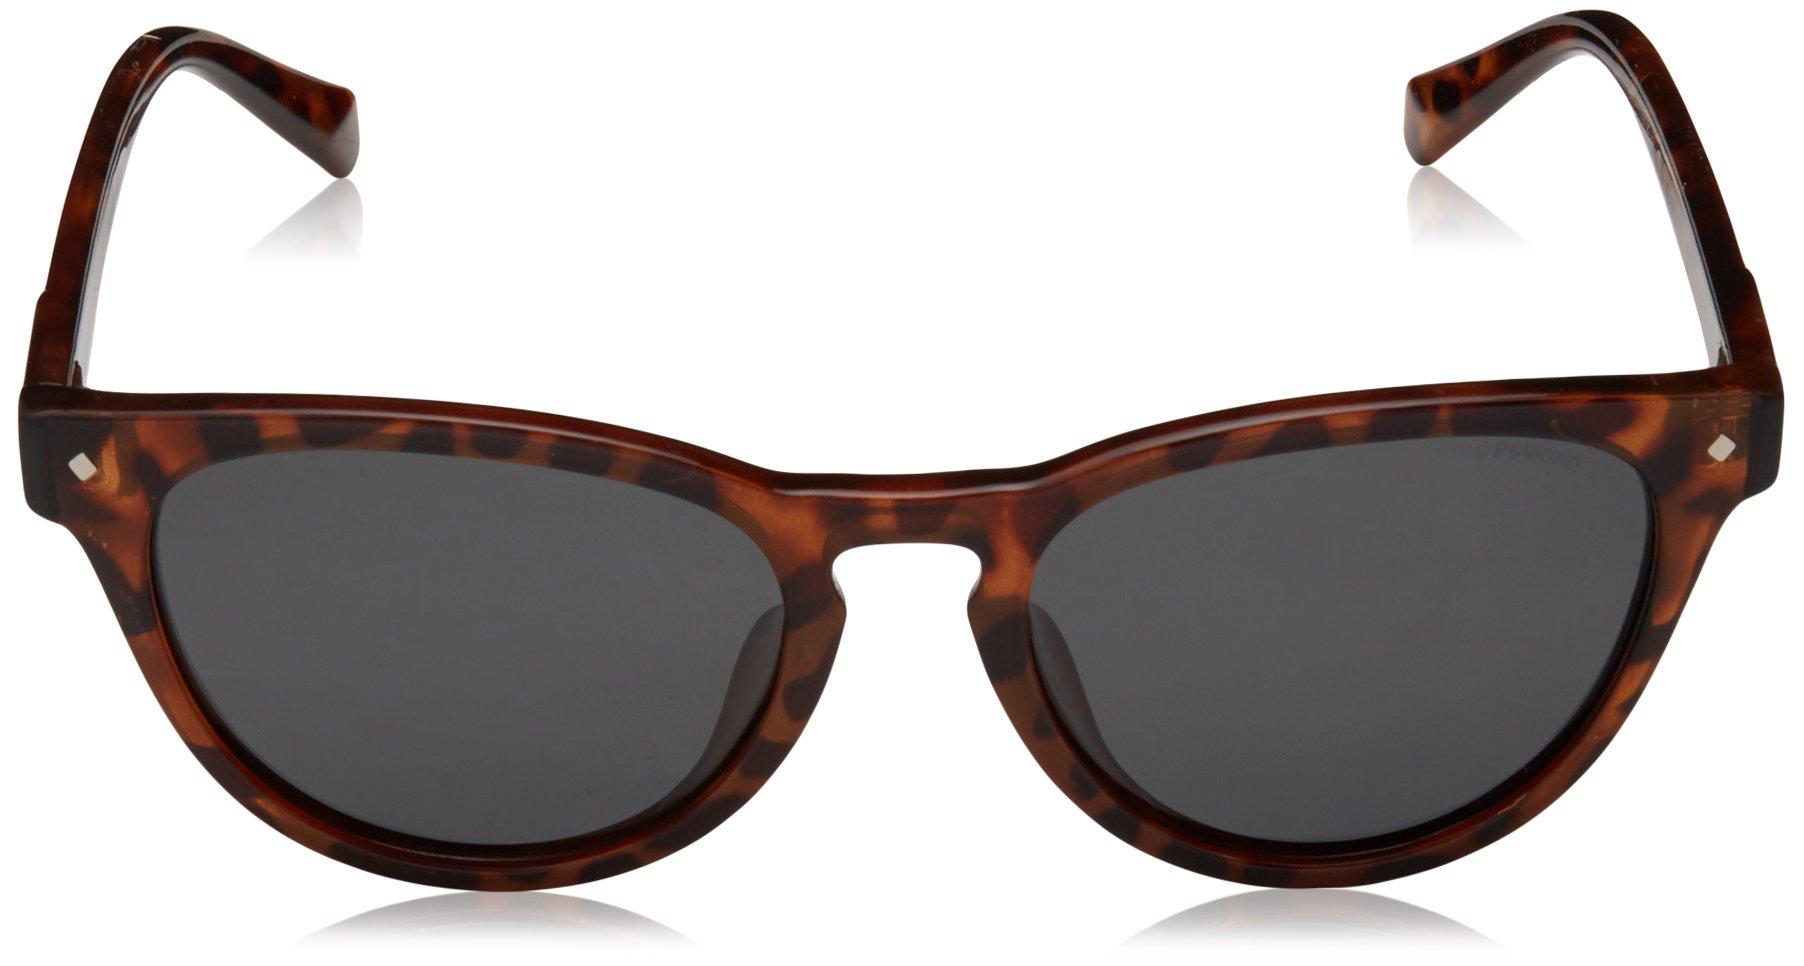 Polaroid Sunglasses Girls' Pld8026fs Polarized Oval Sunglasses, DKHAVANA, 49 mm by Polaroid Sunglasses (Image #2)